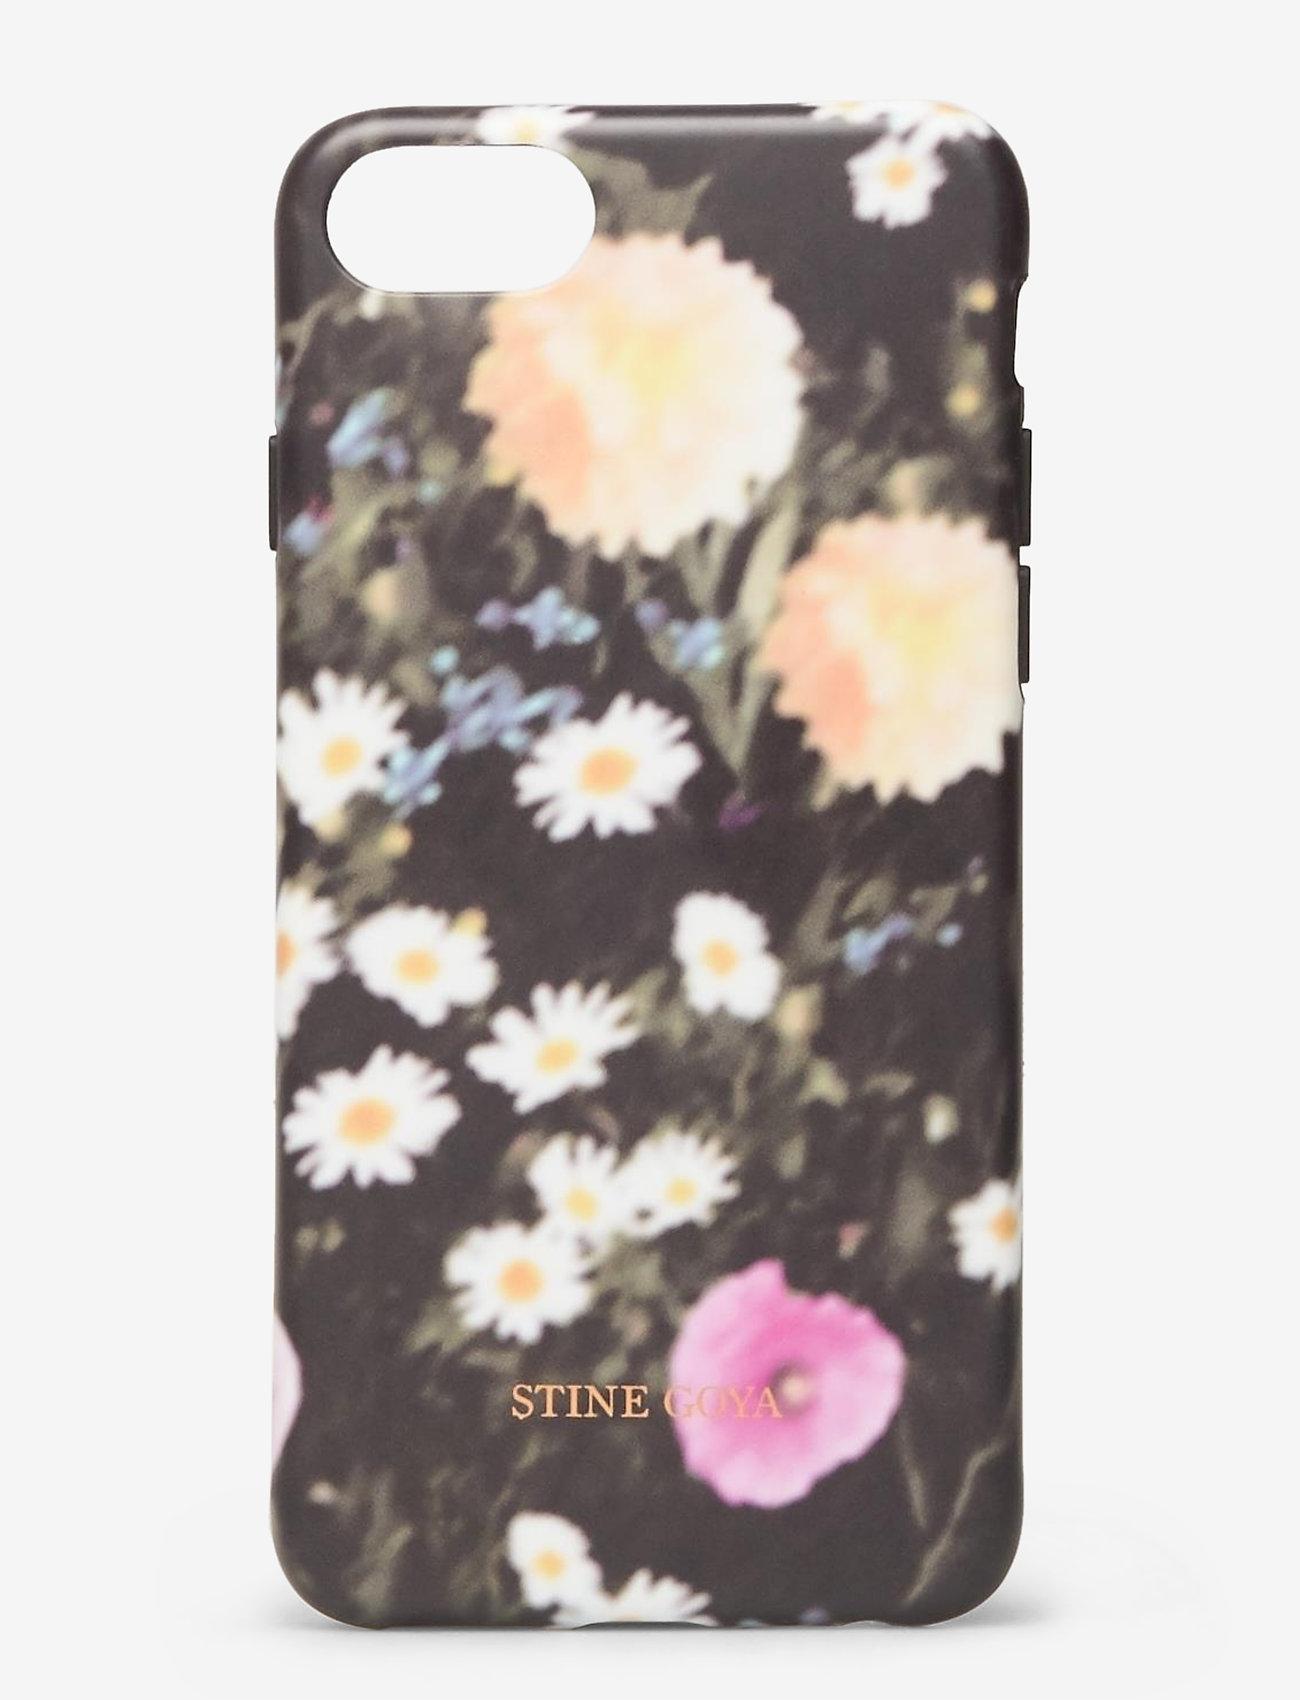 STINE GOYA - Molly, Iphone Cover 6/7/8 - puhelimen kuoret - poppy - 0